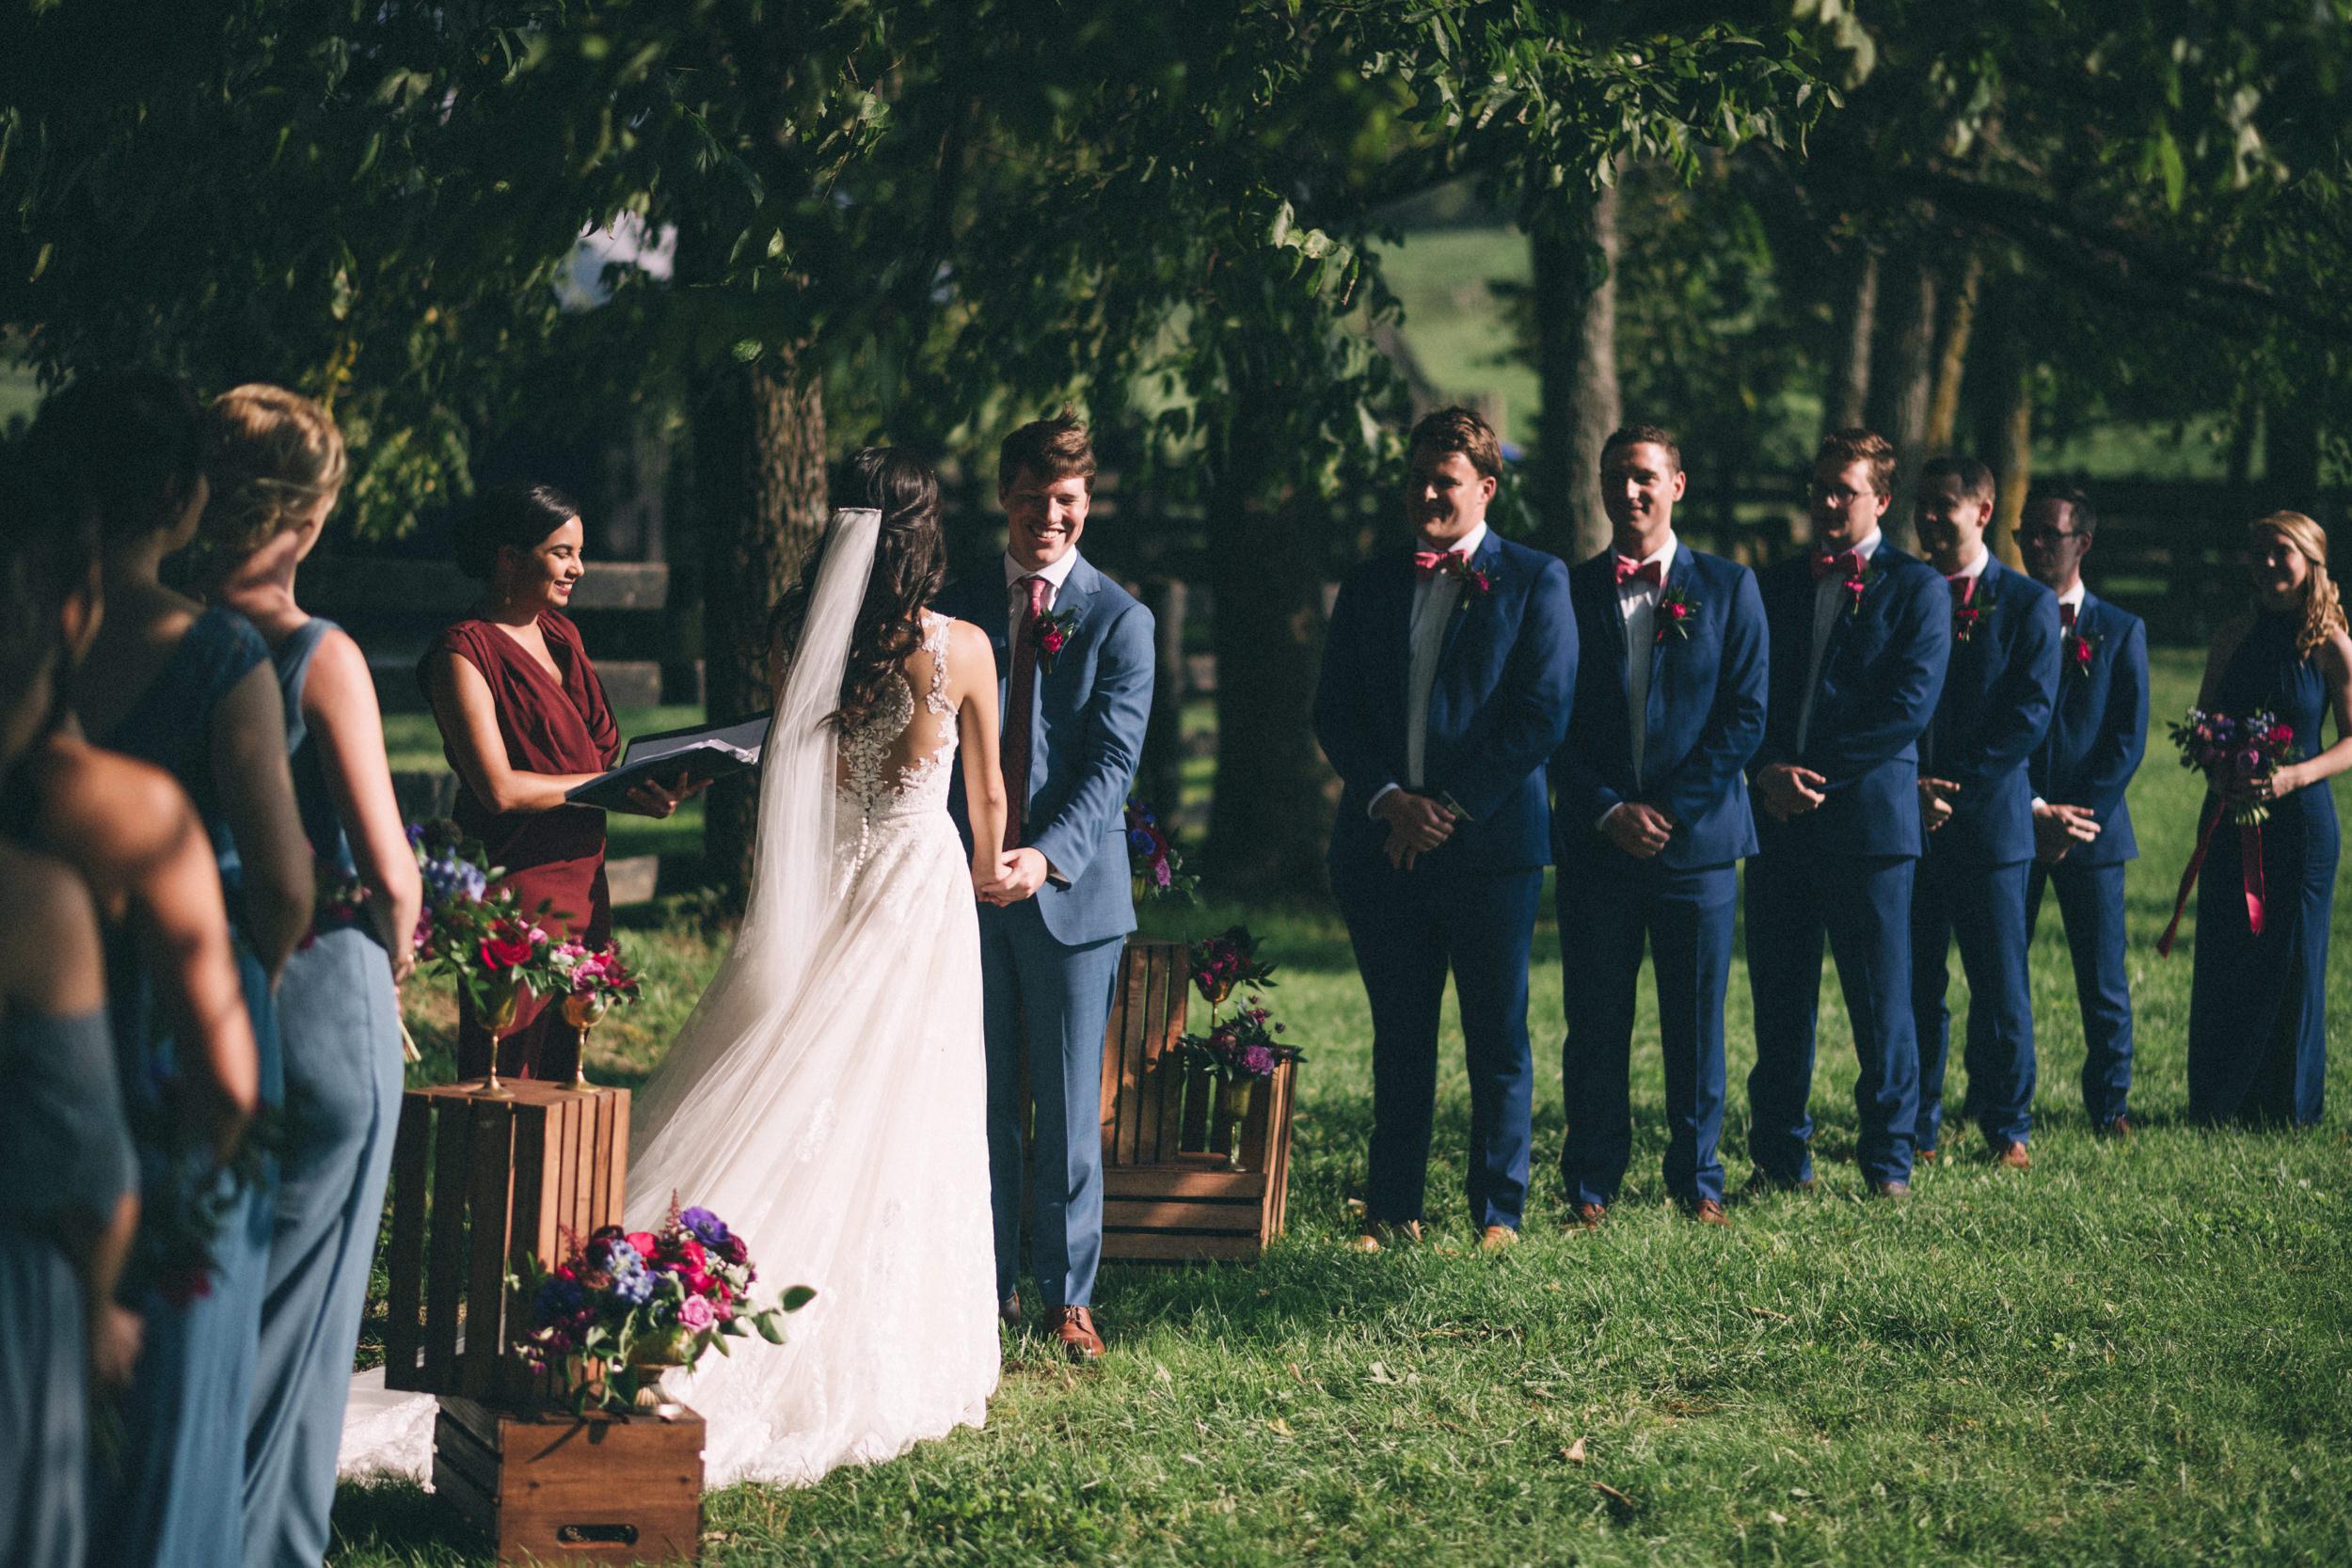 Louisville-Kentucky-Wedding-and-Elopement-Photographer-Sarah-Katherine-Davis-Photography-Summer-Jewel-Toned-Wedding-Chineese-Tea-Ceremony-Warrenwood-Manor-Danville-517.jpg